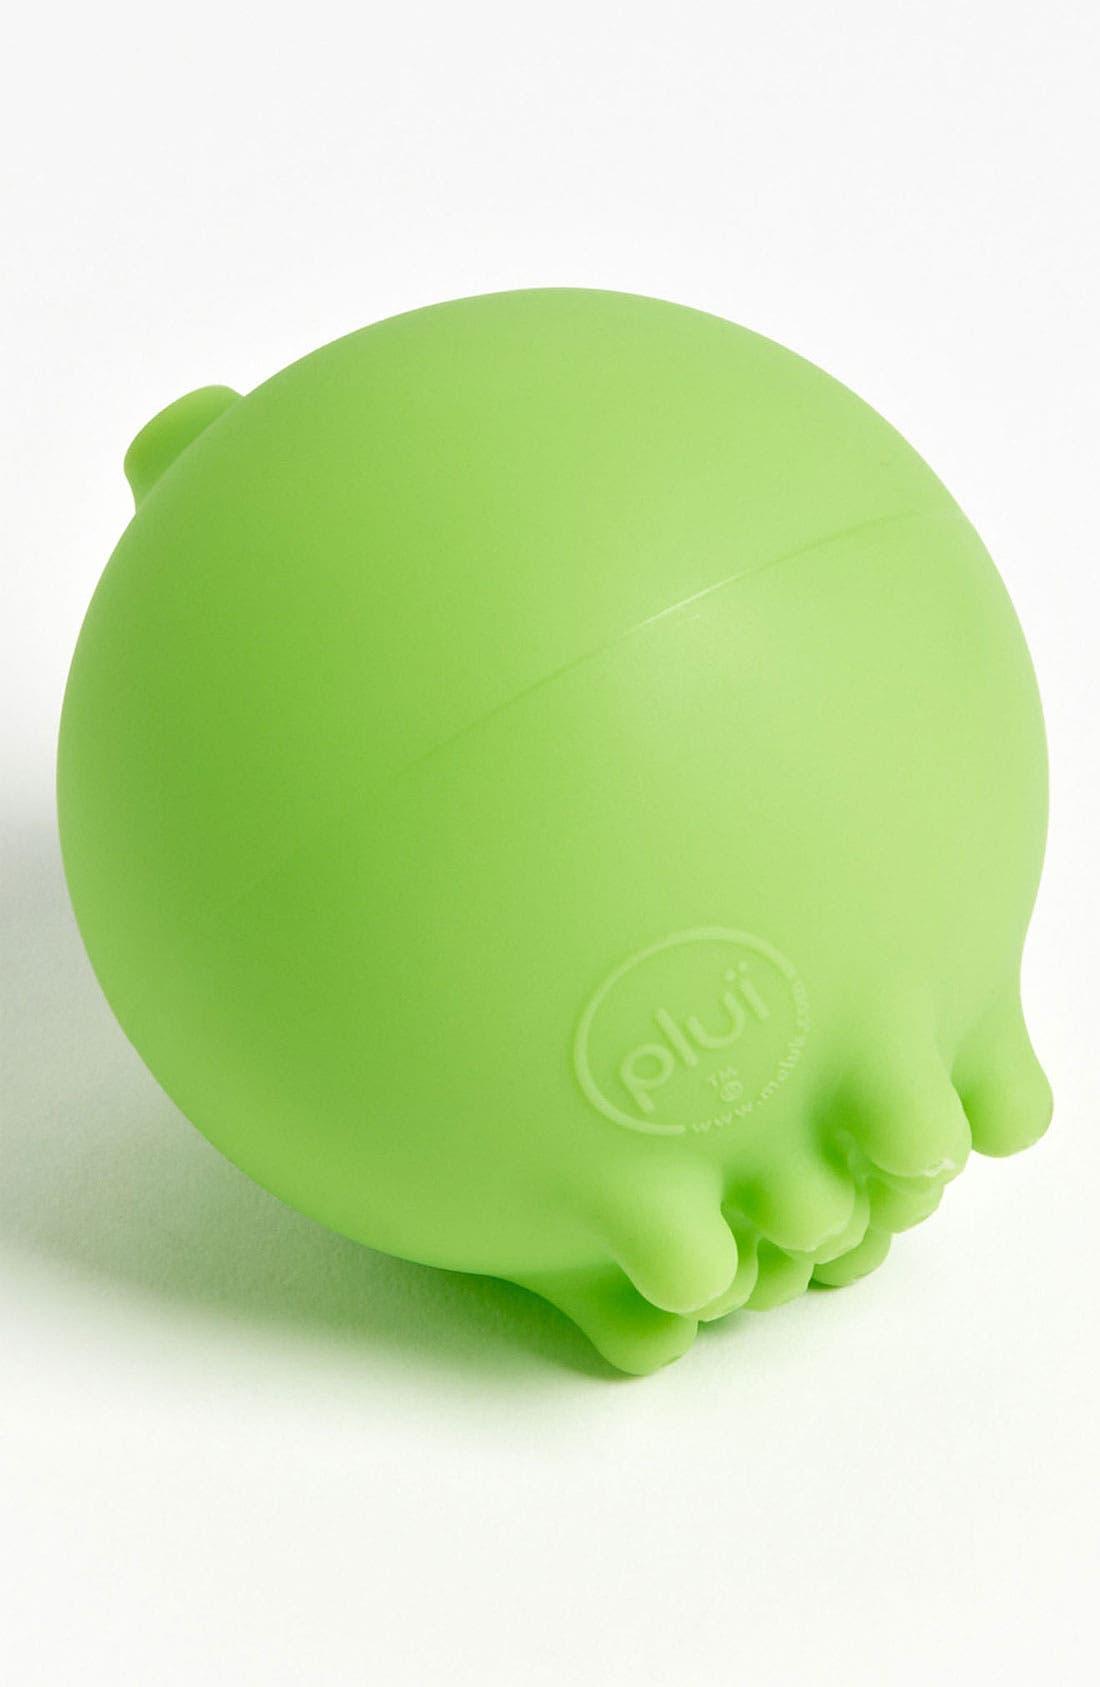 Main Image - Kid O 'Plui' Bath Toy